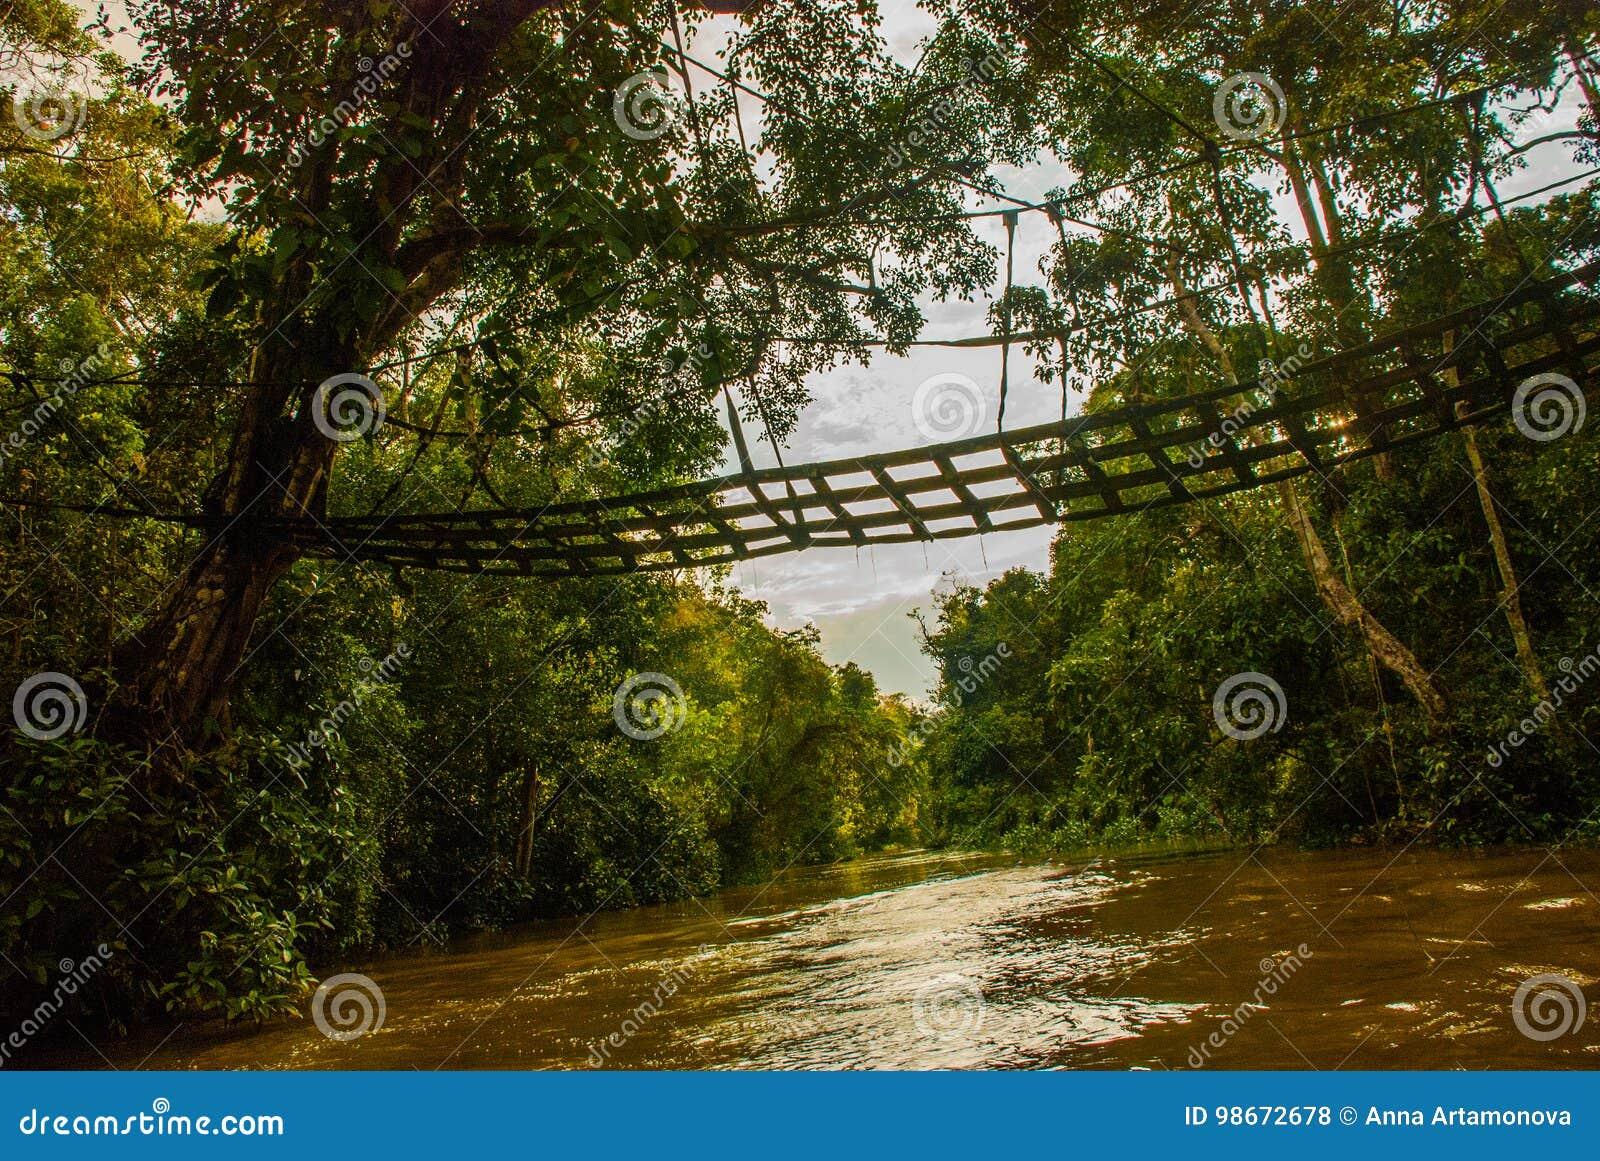 Kinabatangan-Fluss, Regenwald von Borneo-Insel, Sabah Malaysia